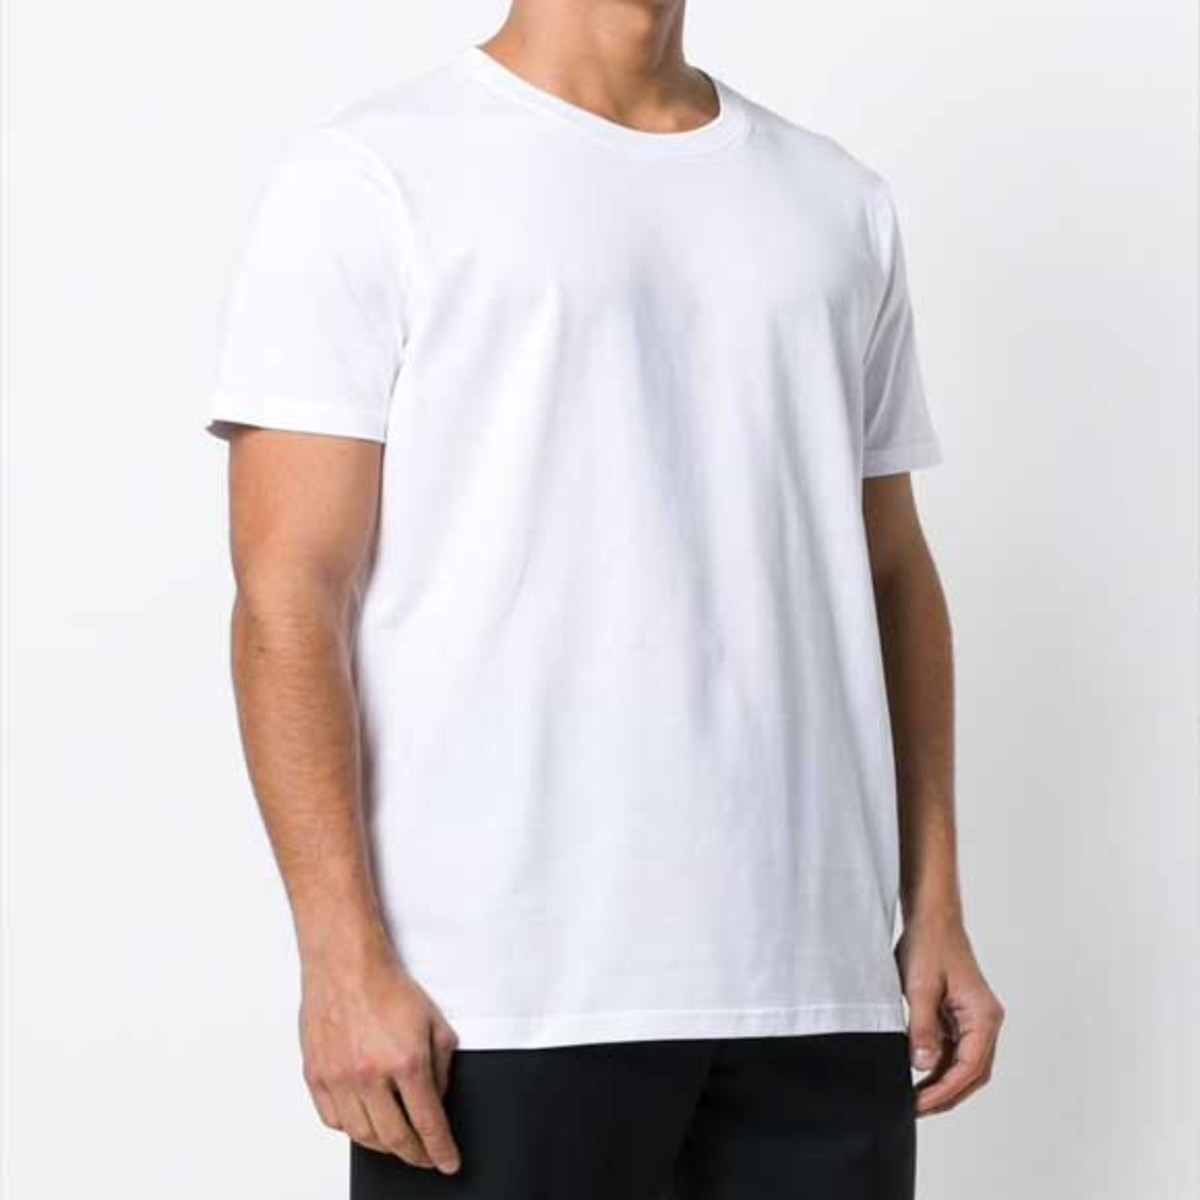 f6c9162eeb Camiseta Dry Fit 100% Poliamida Malha Fria Corrida Masculina no Elo7 ...